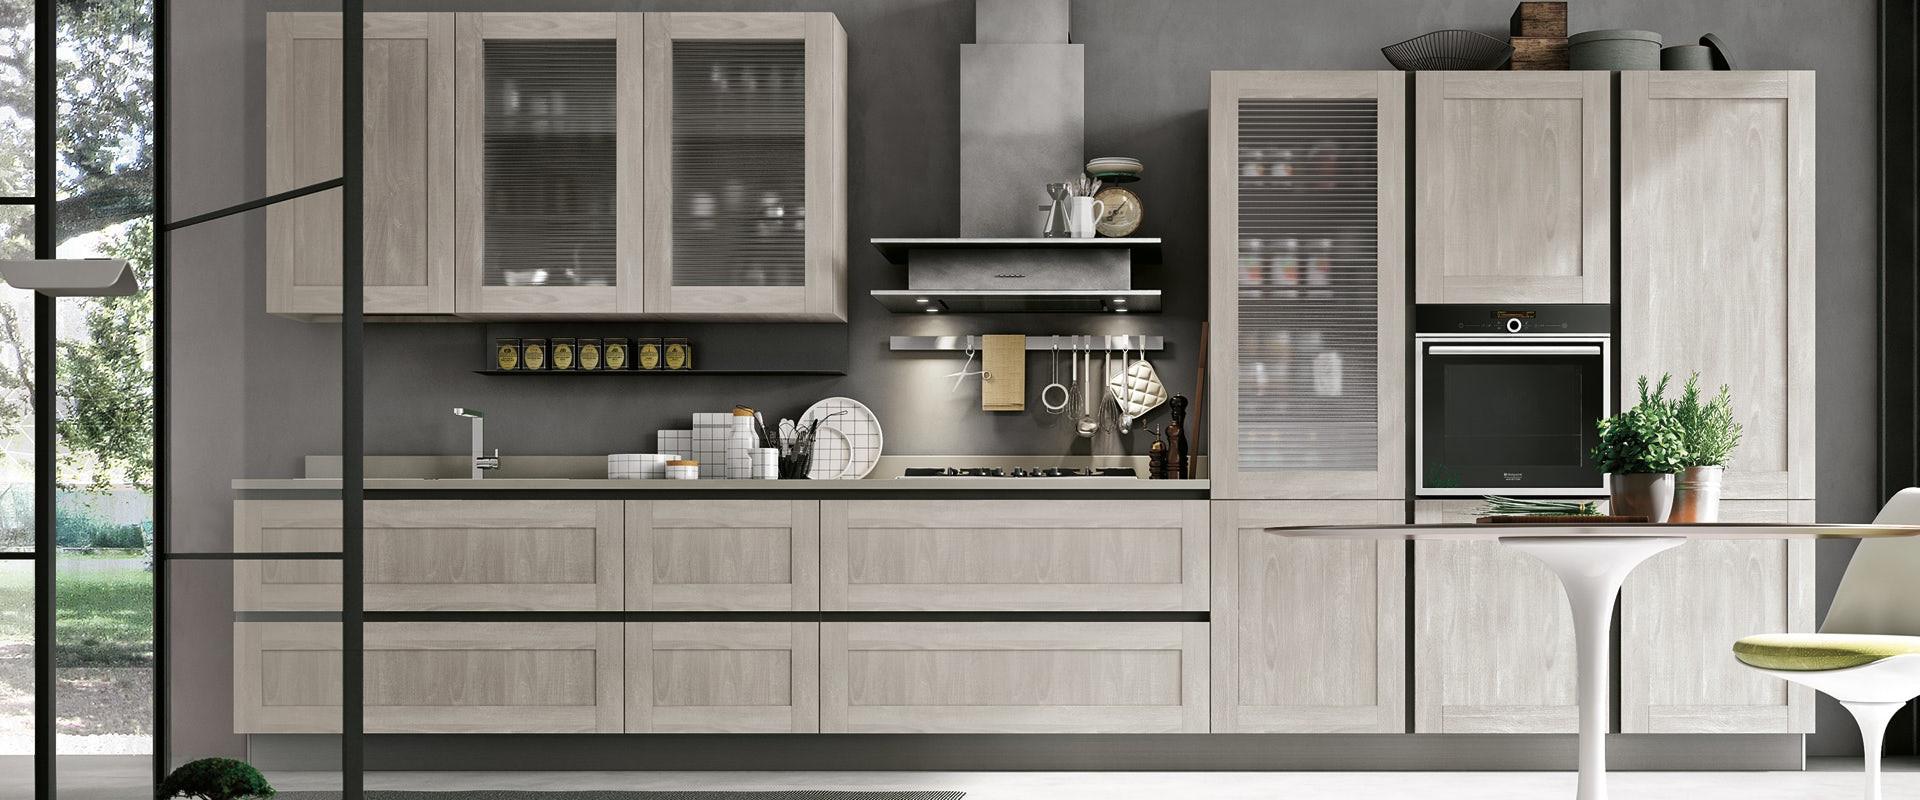 stosa-cucine-moderne-city-278.jpg